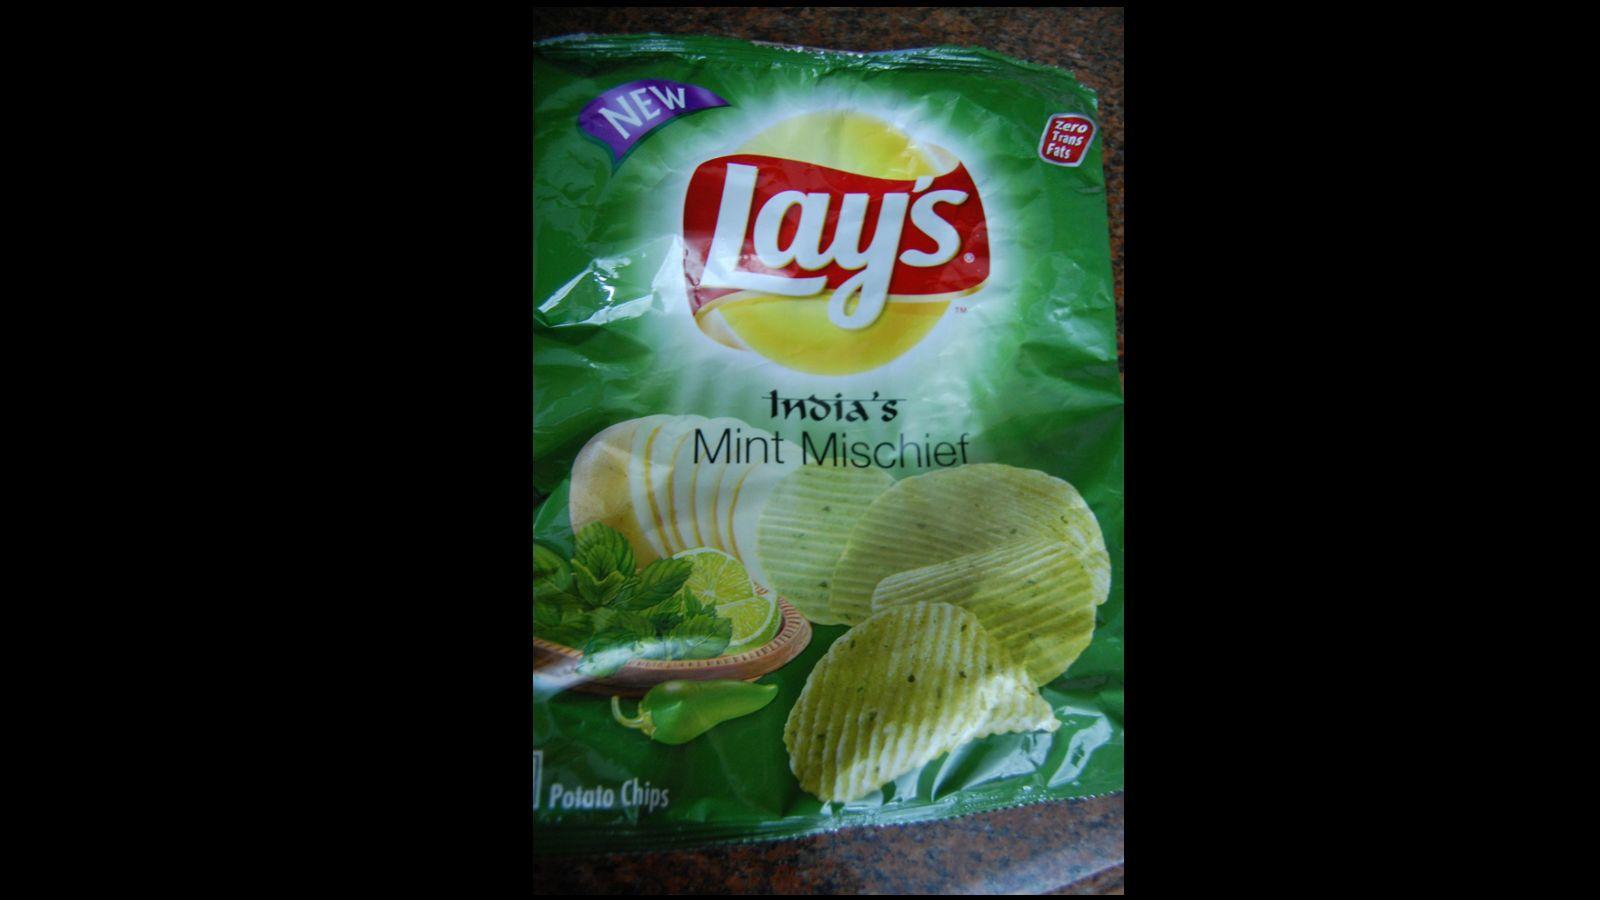 Mentolos Lay's, India